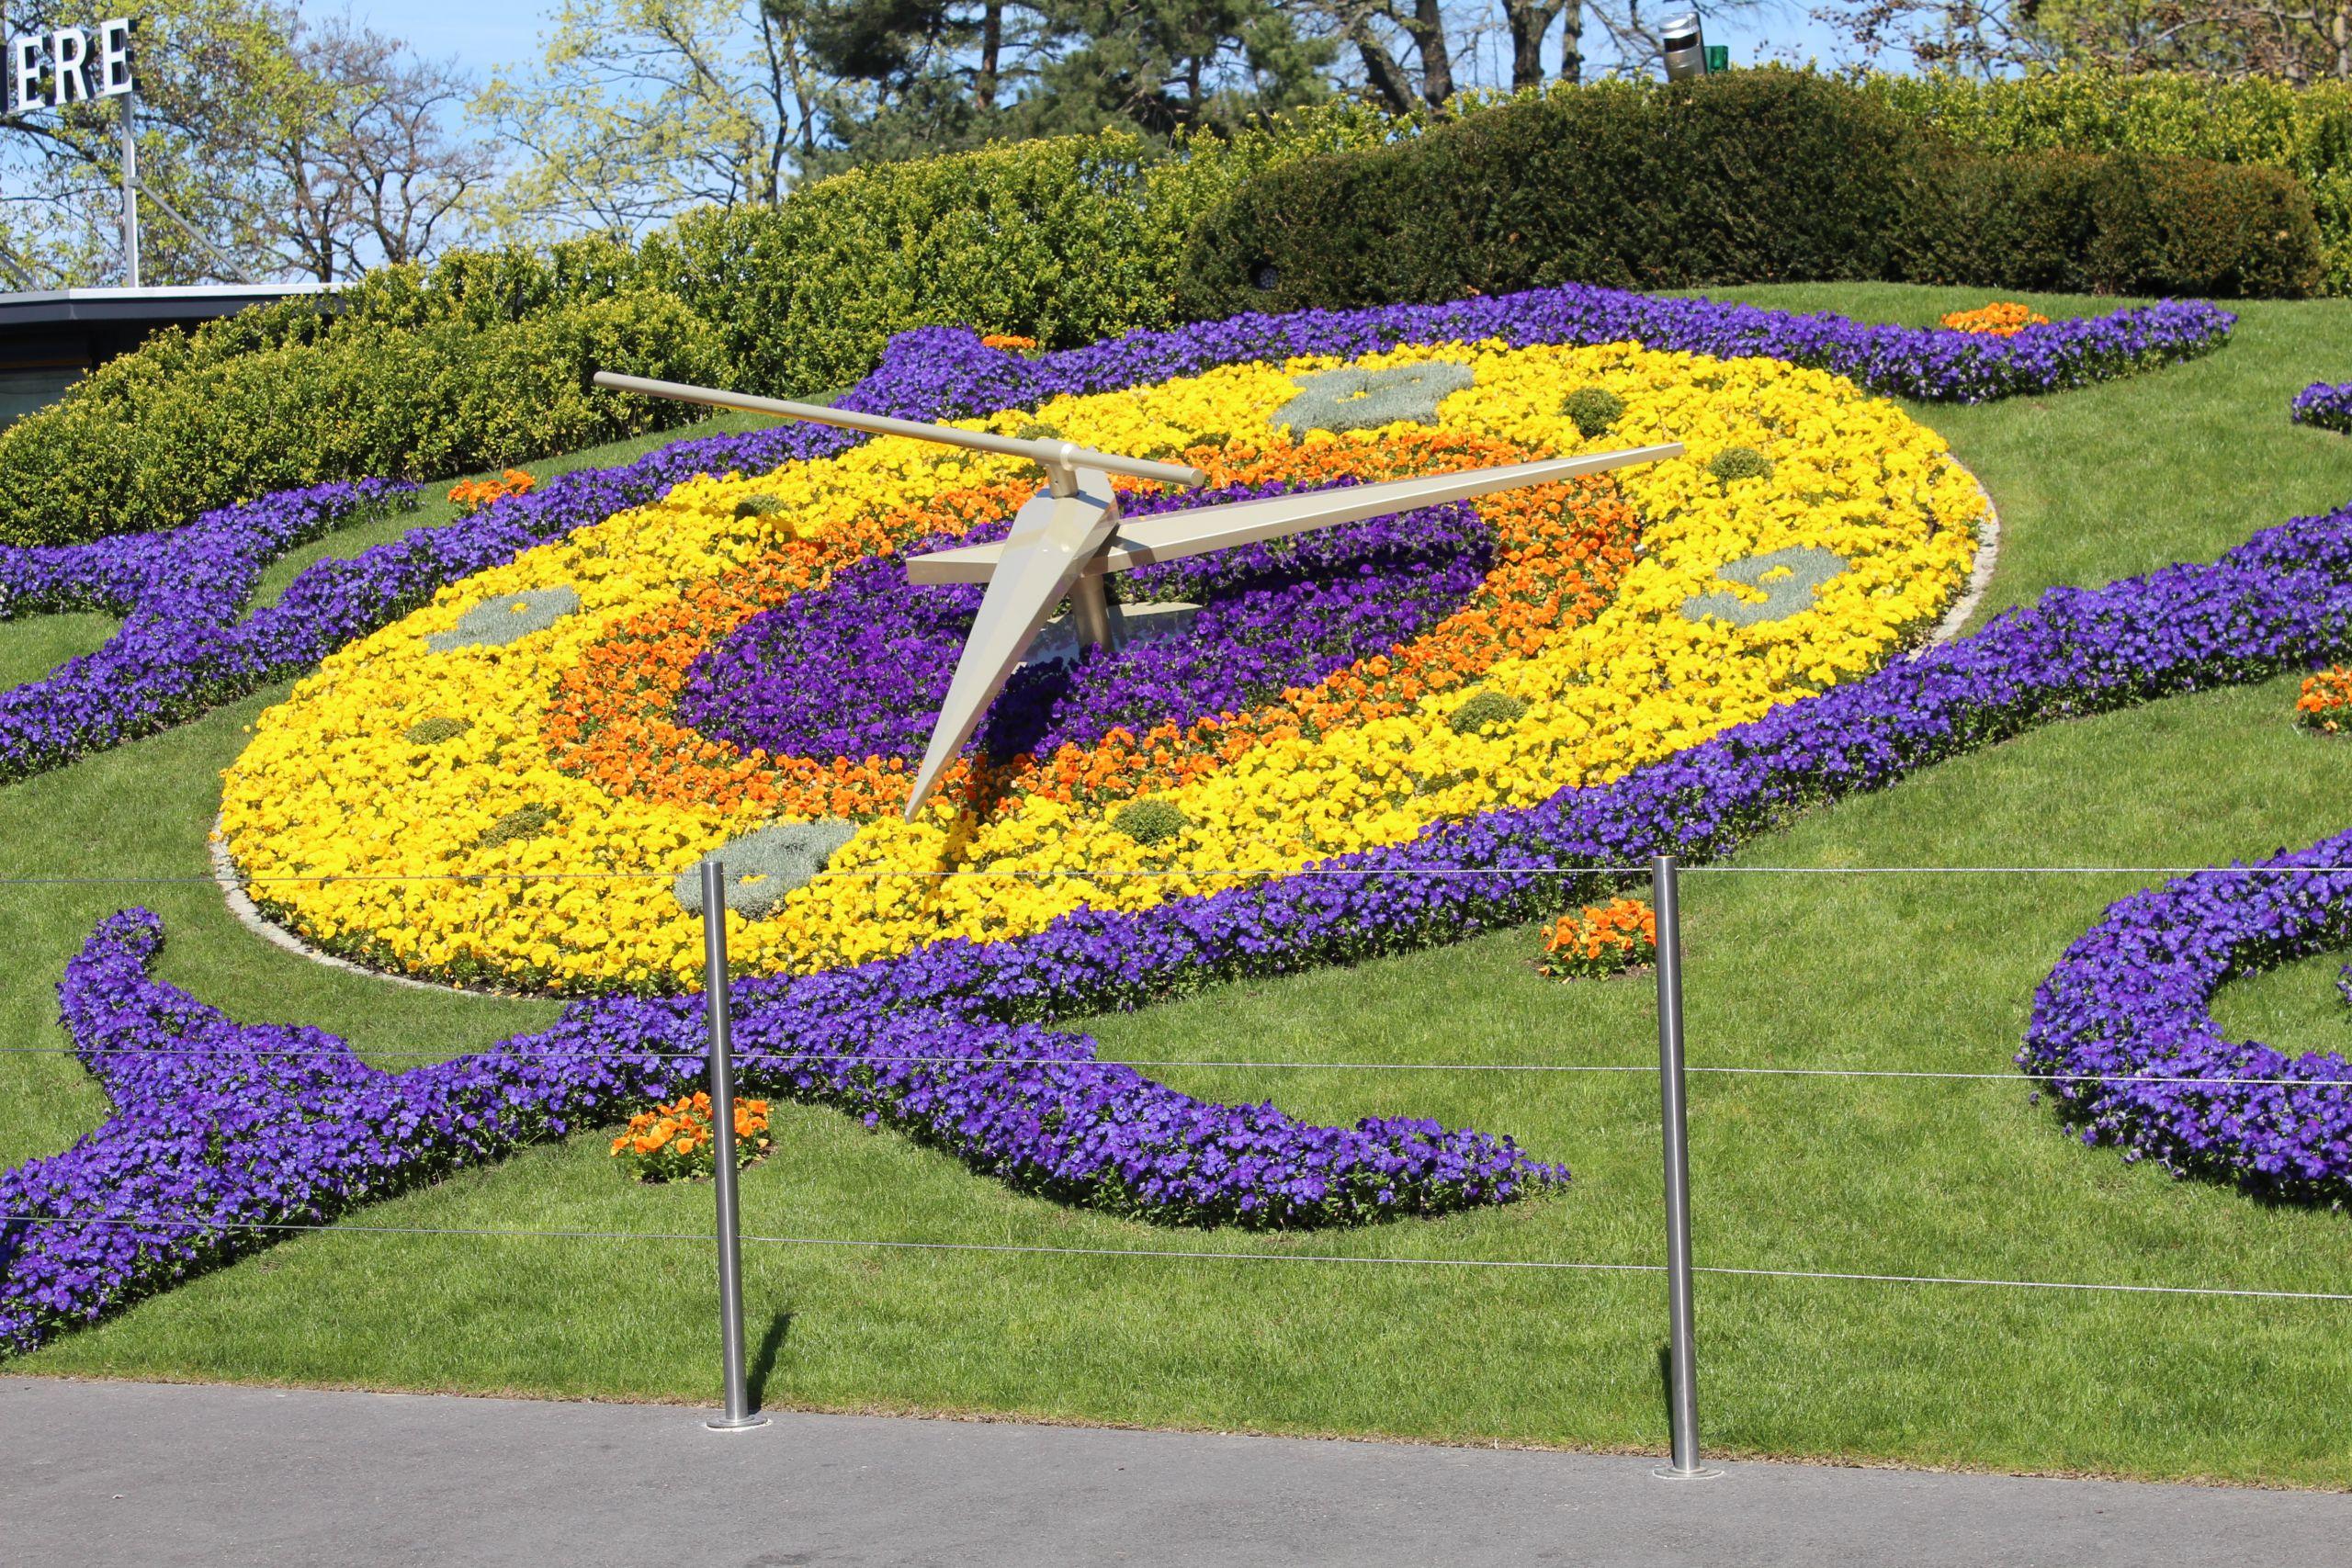 filehorloge fleurie parc jardin anglais geneve 2